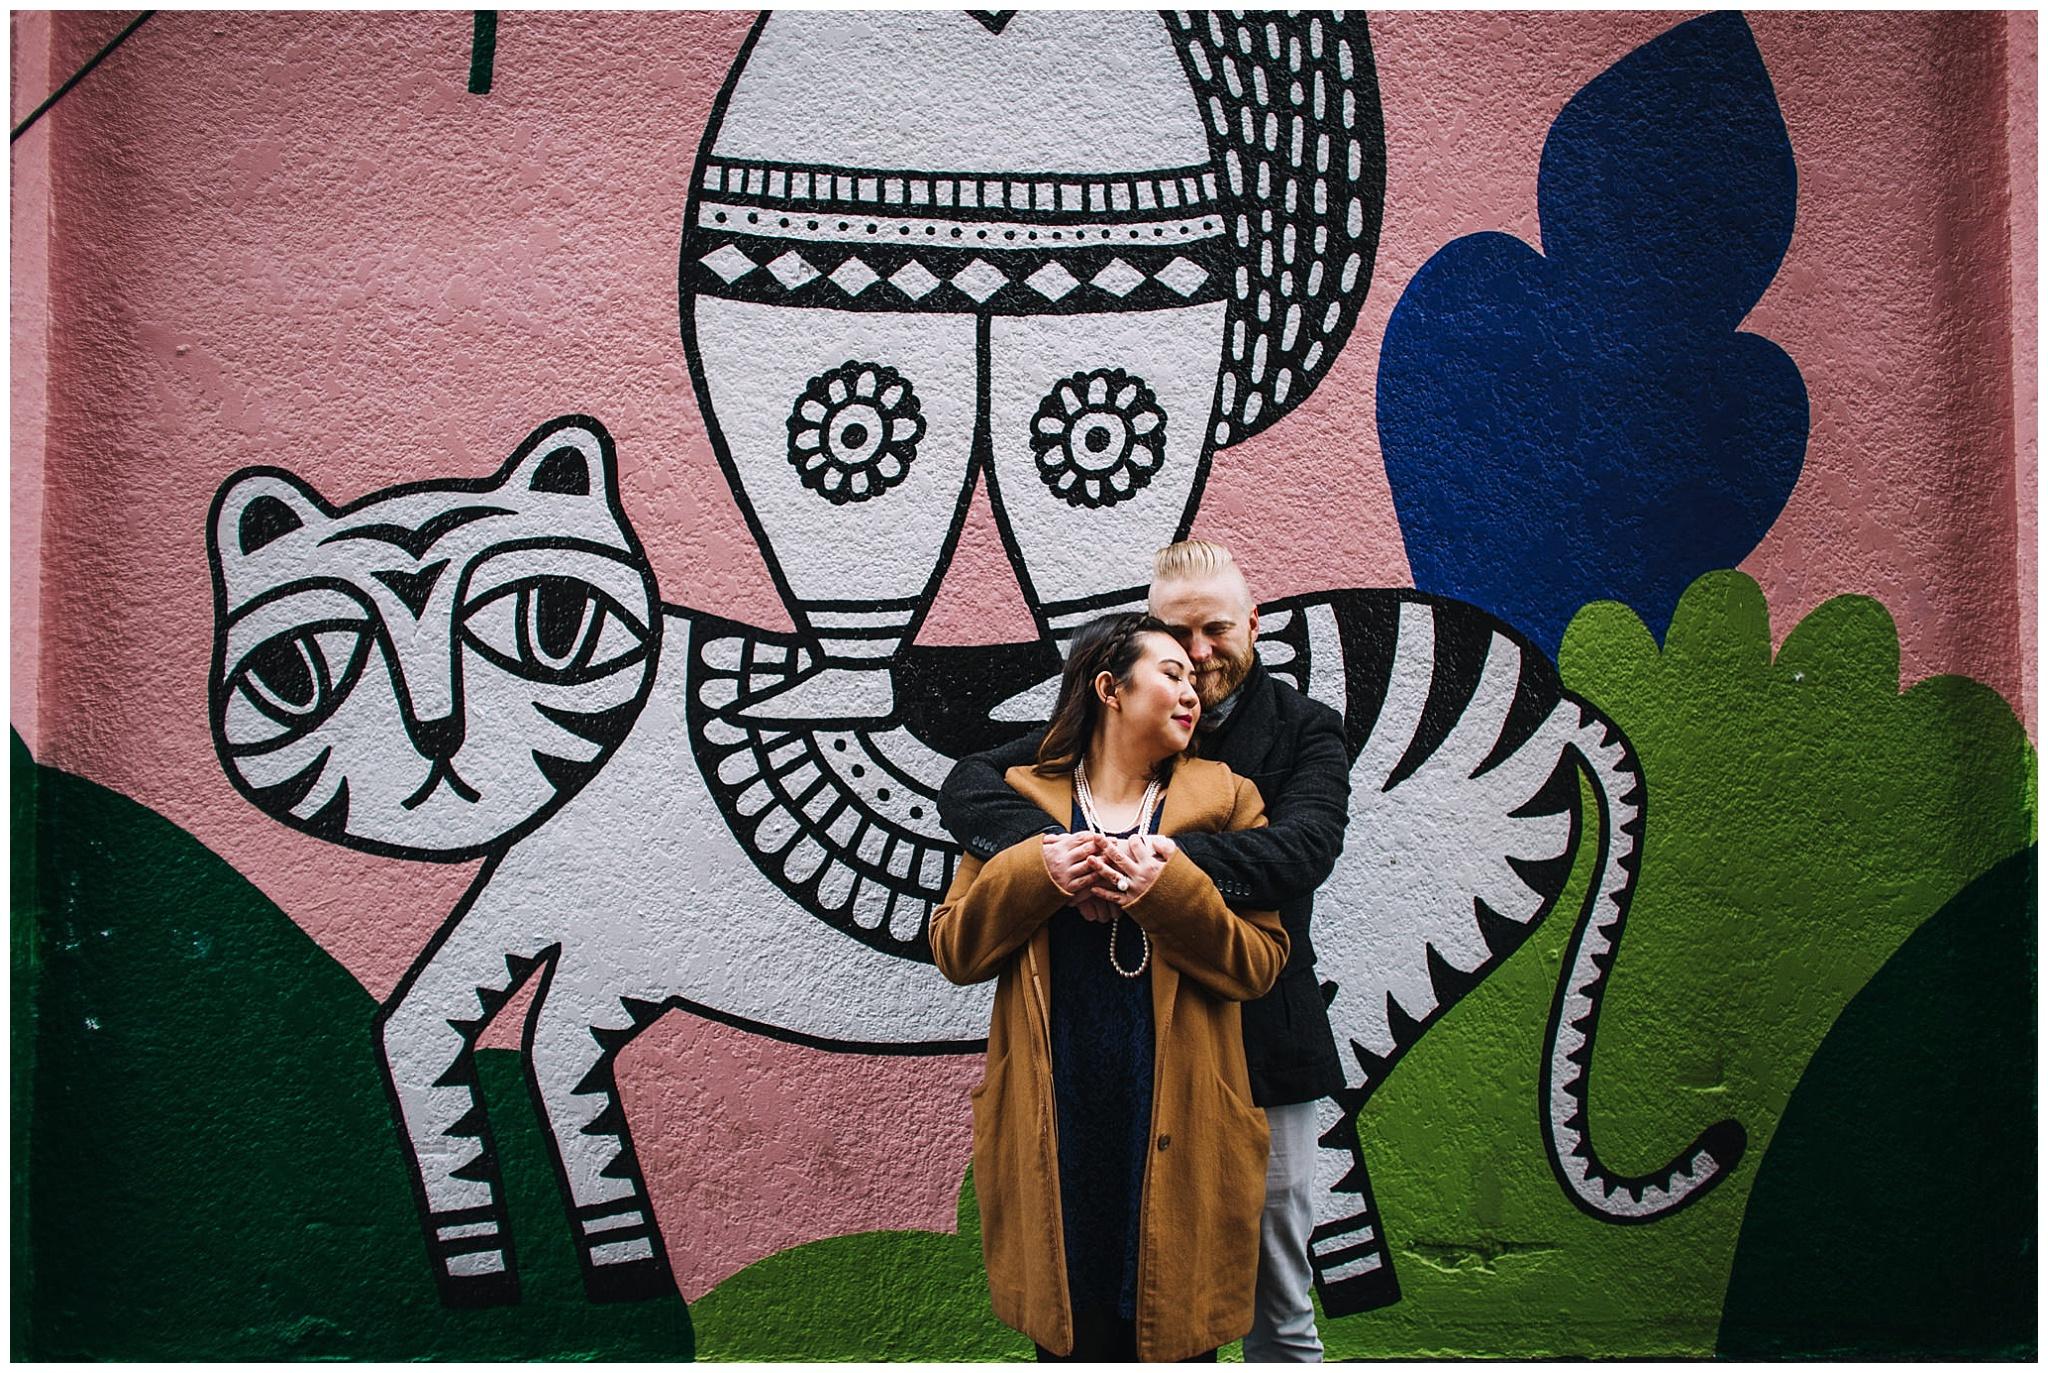 vancouver mural festival 2017 engagement photos sandeep johal artist